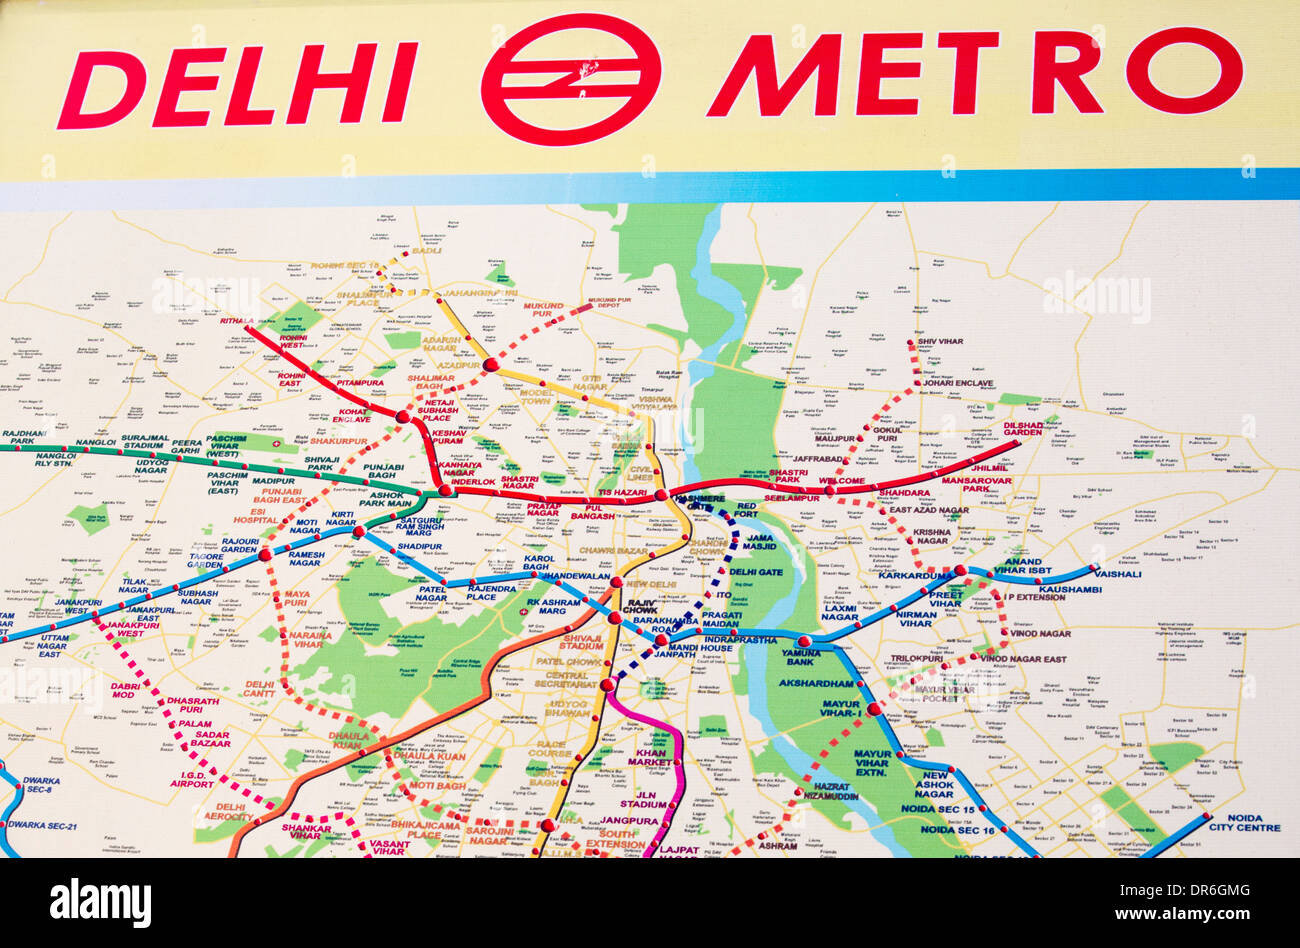 The Delhi Metro, India Stock Photo: 65913024 - Alamy